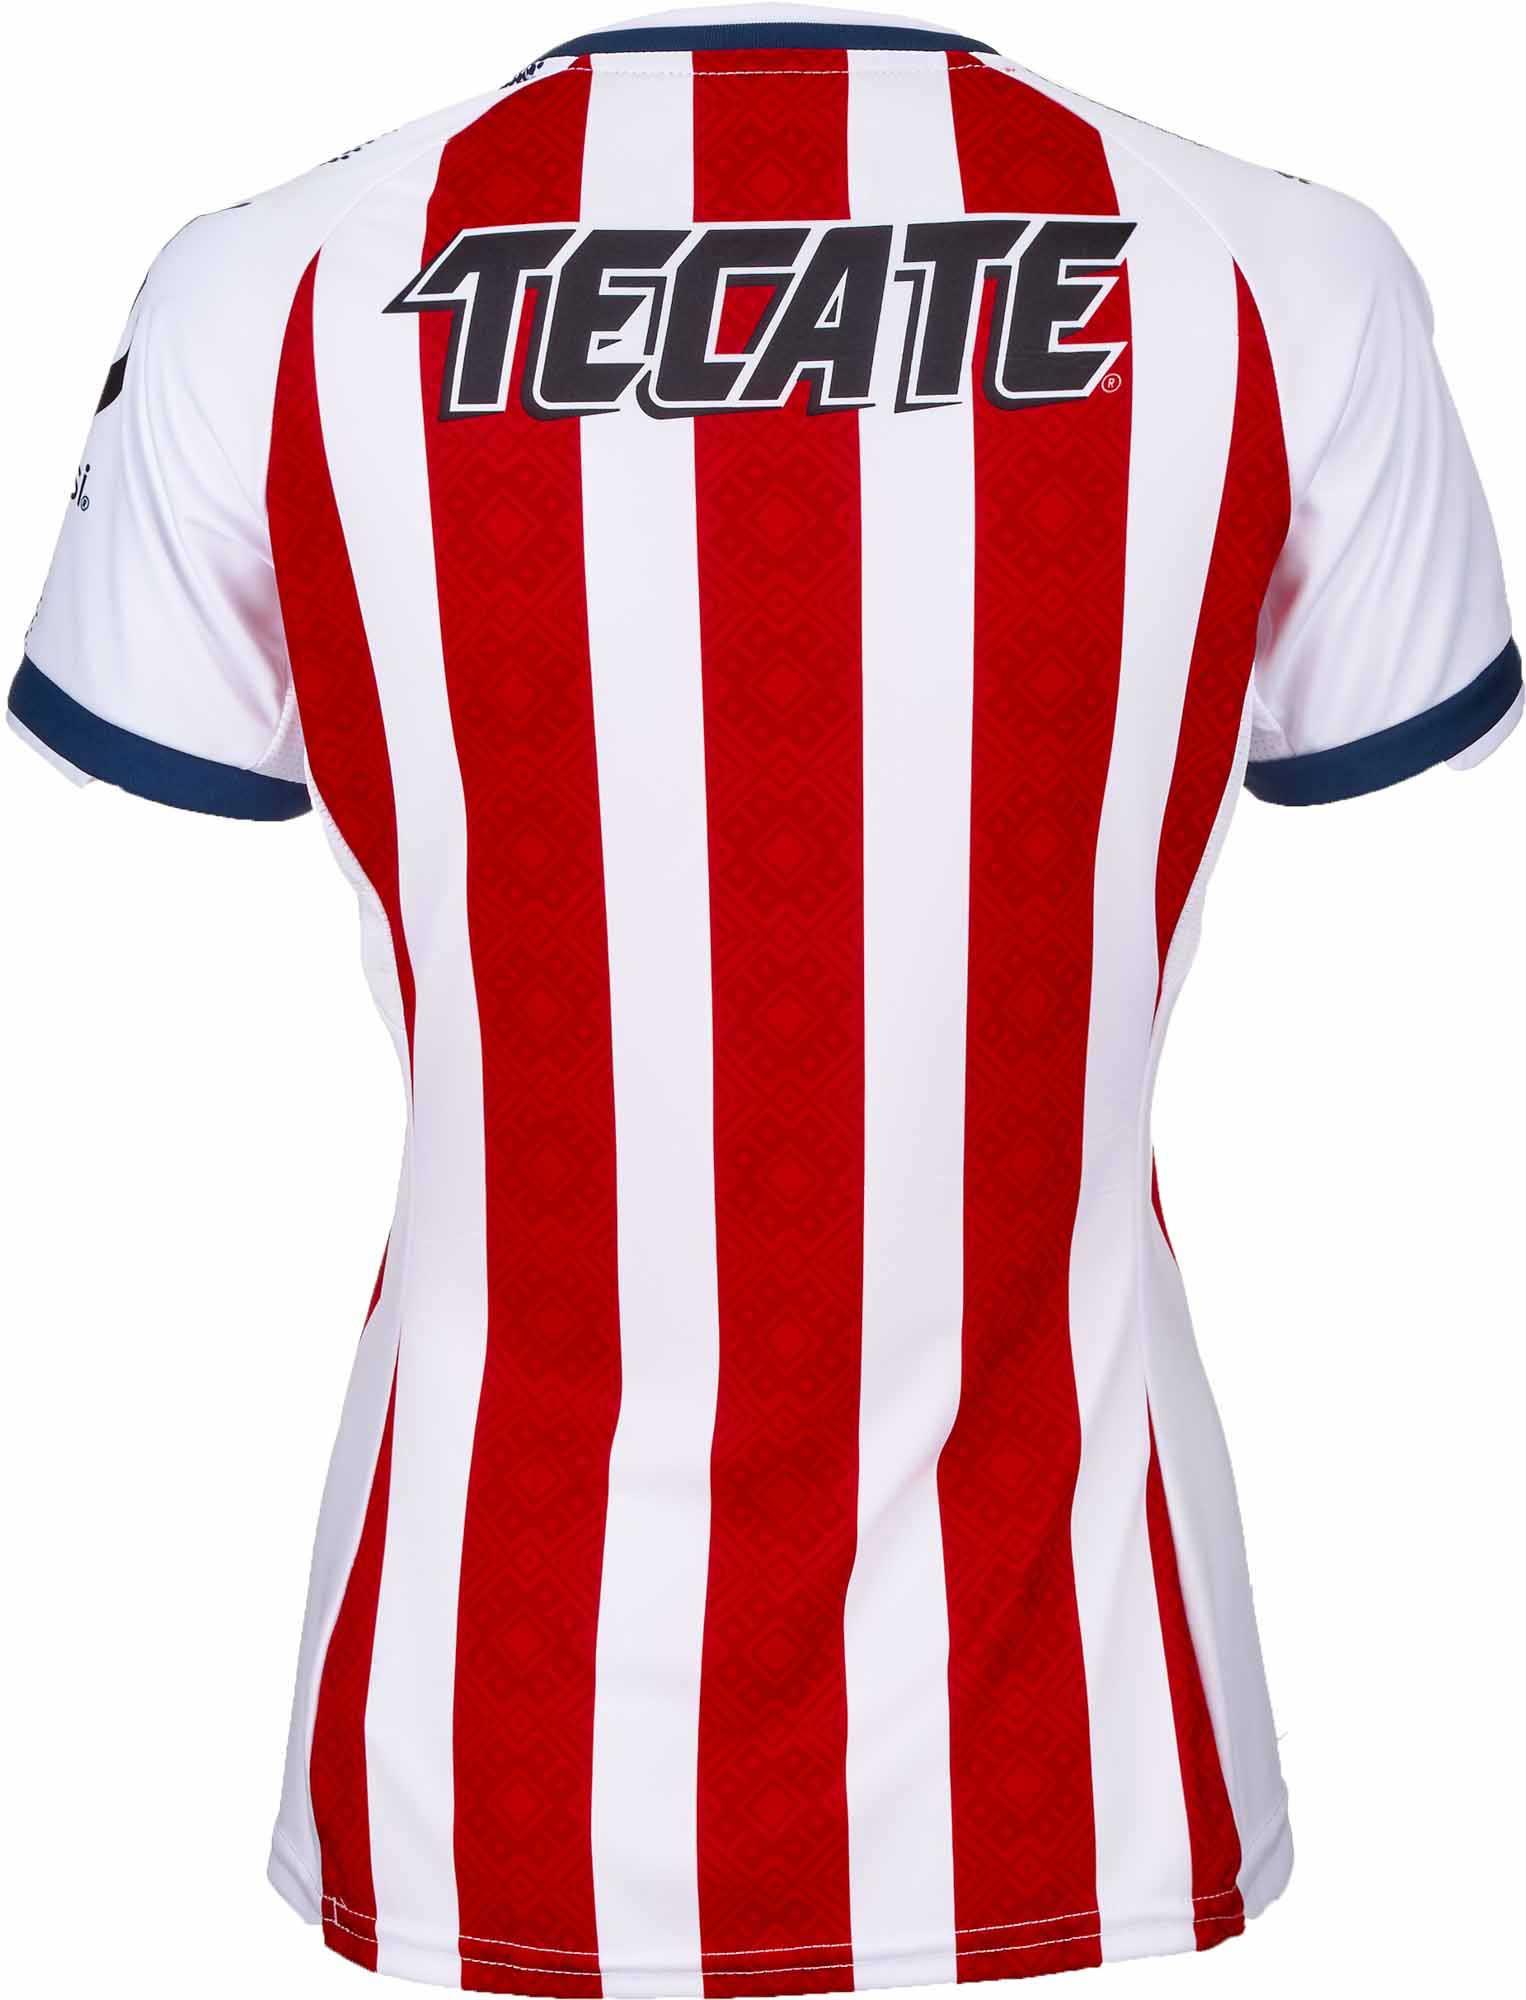 116dcfda430 2017 18 Puma Chivas Women Home Jersey - SoccerPro.com